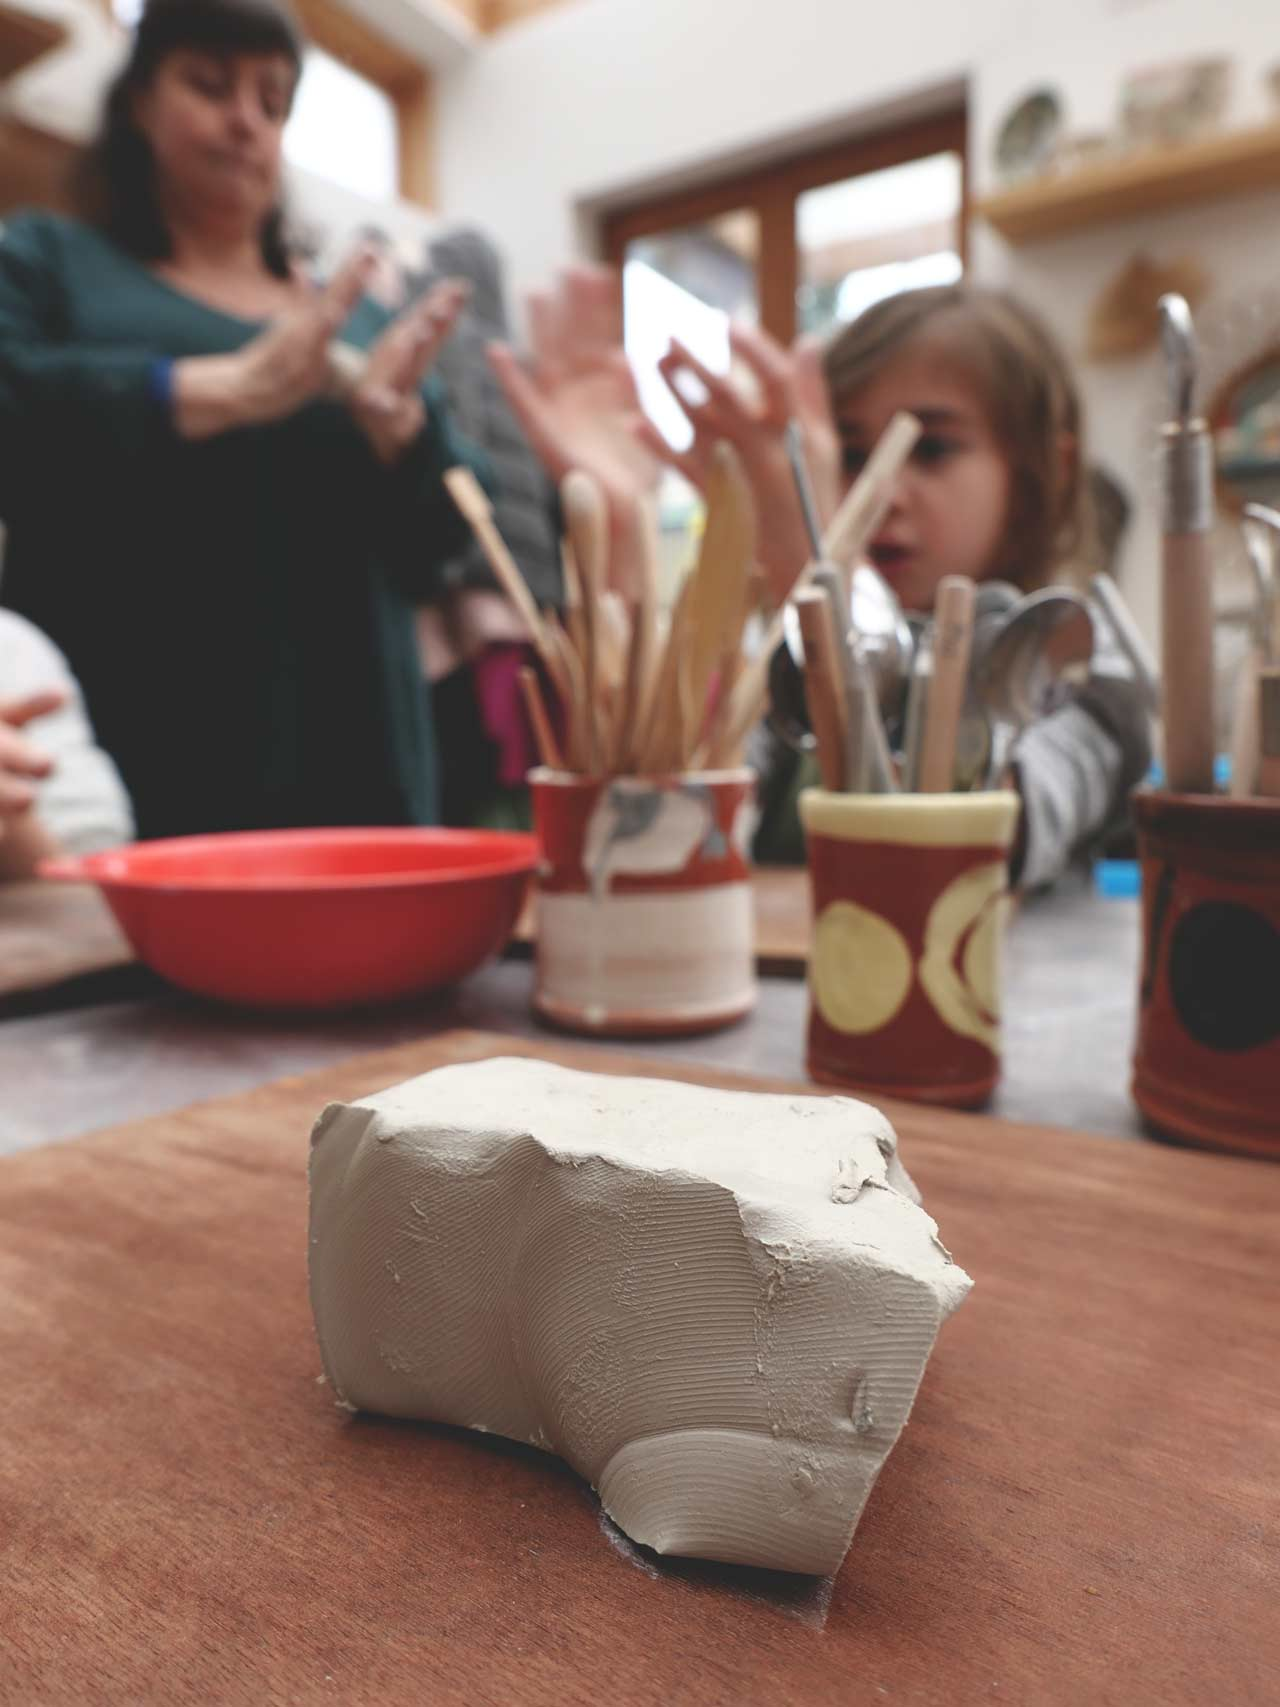 Idee-cadeau-atelier-poterie-6-nelly-genisson